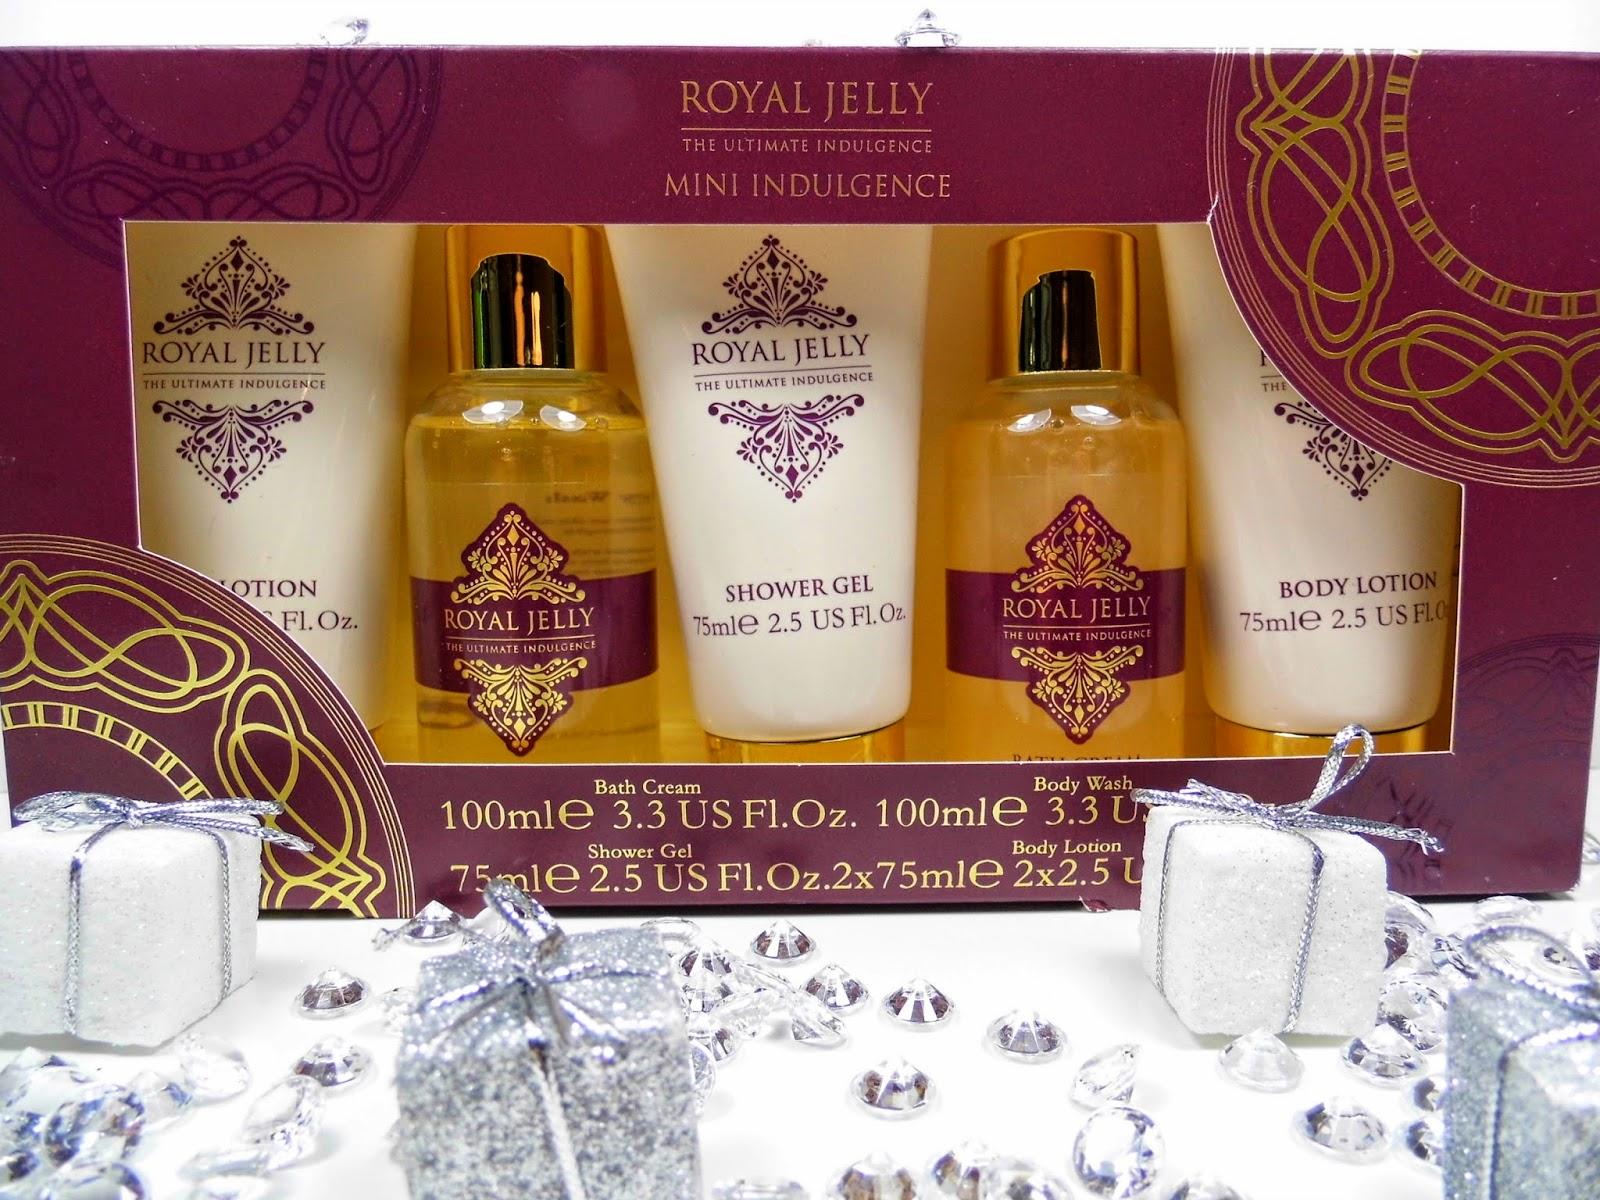 royal jelly mini indulgence gift set christmas gift guide 10 under